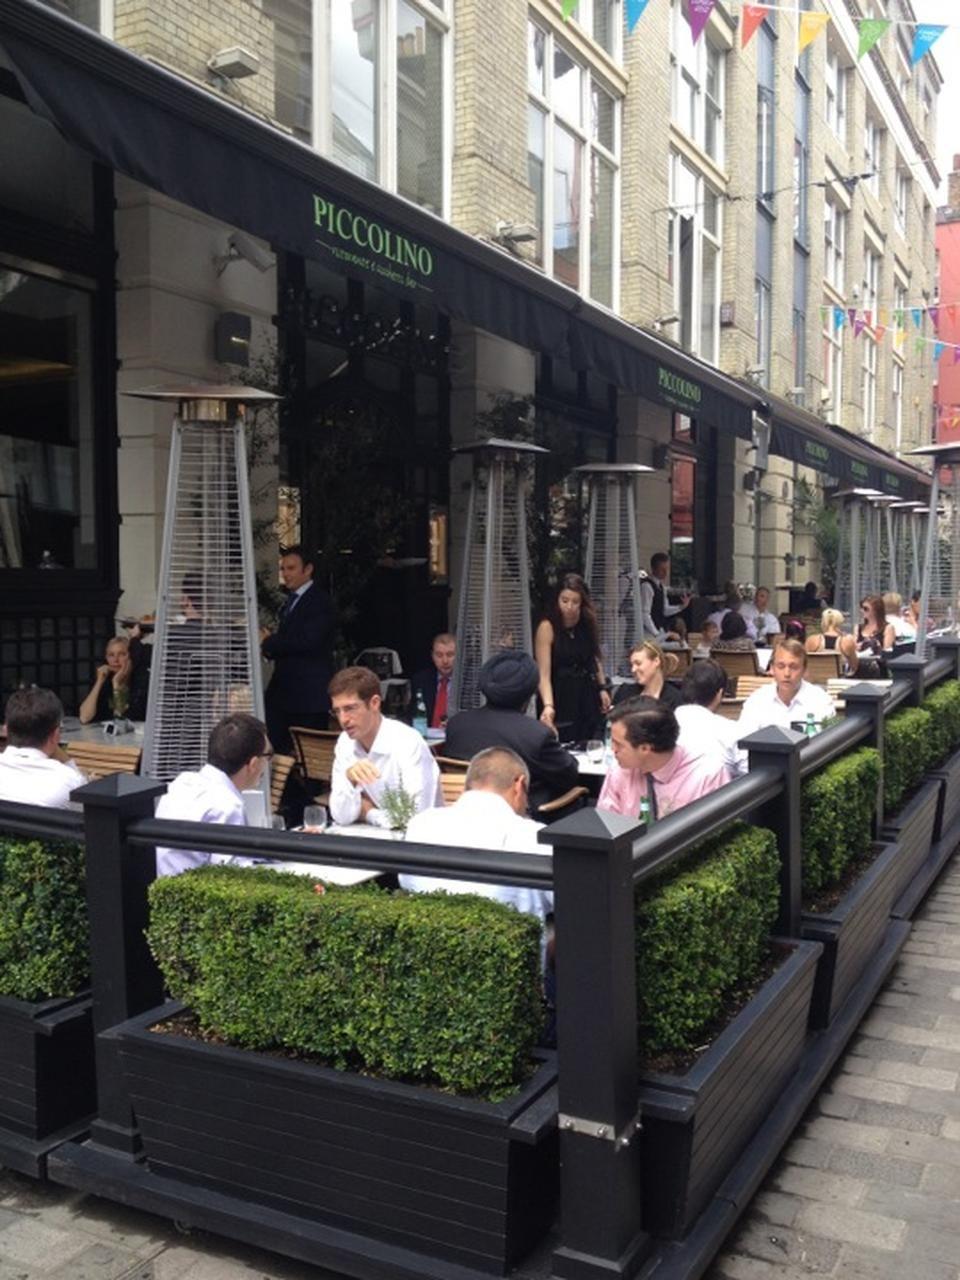 Piccolino Restaurant Exterior Restaurant Patio Cafe Design